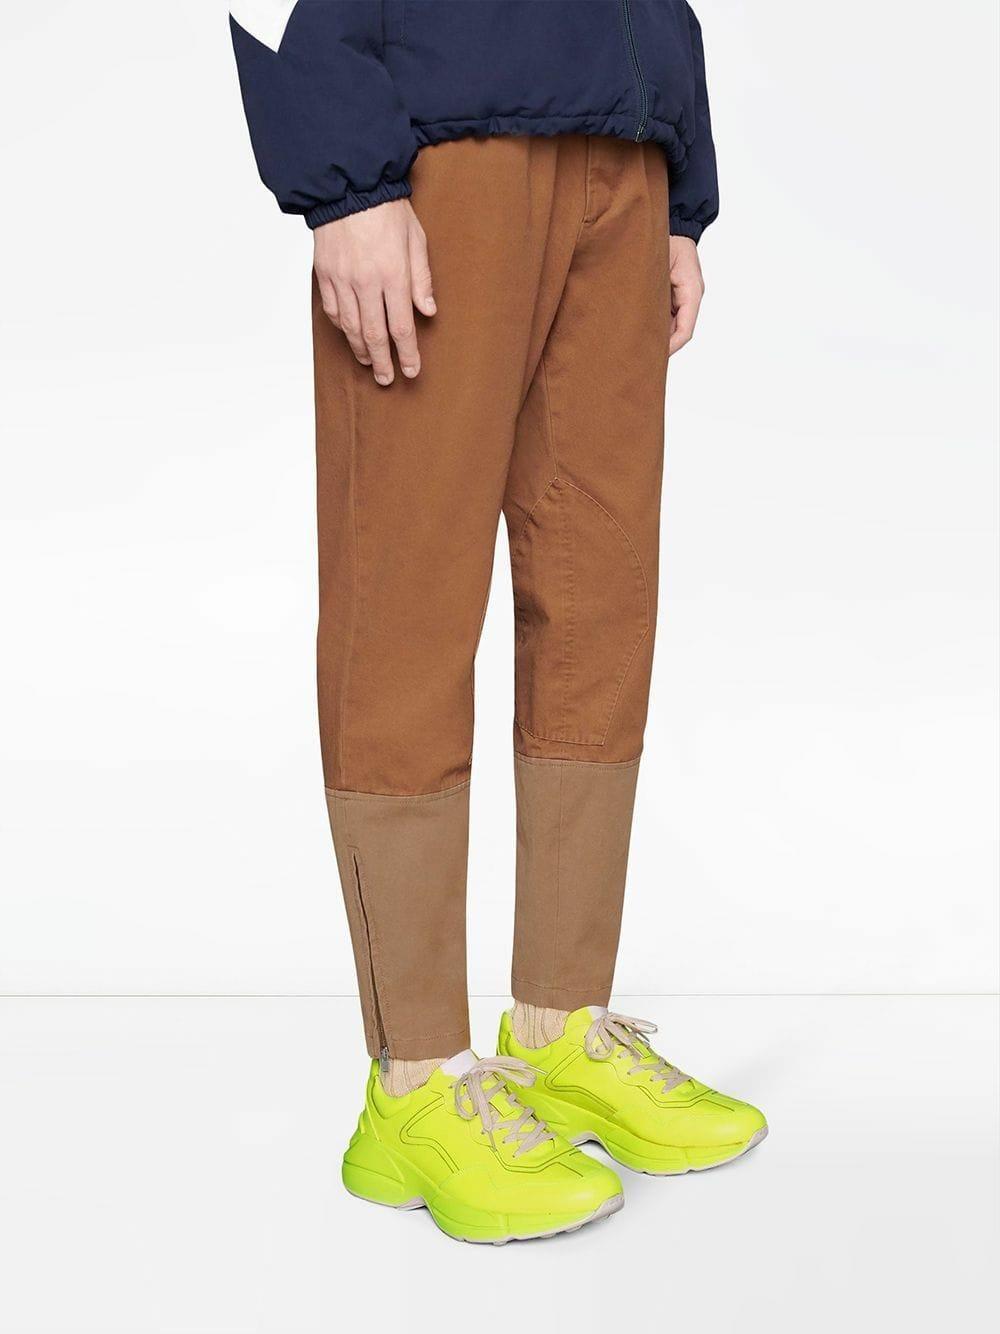 Gucci Rhyton Fluorescent Leather